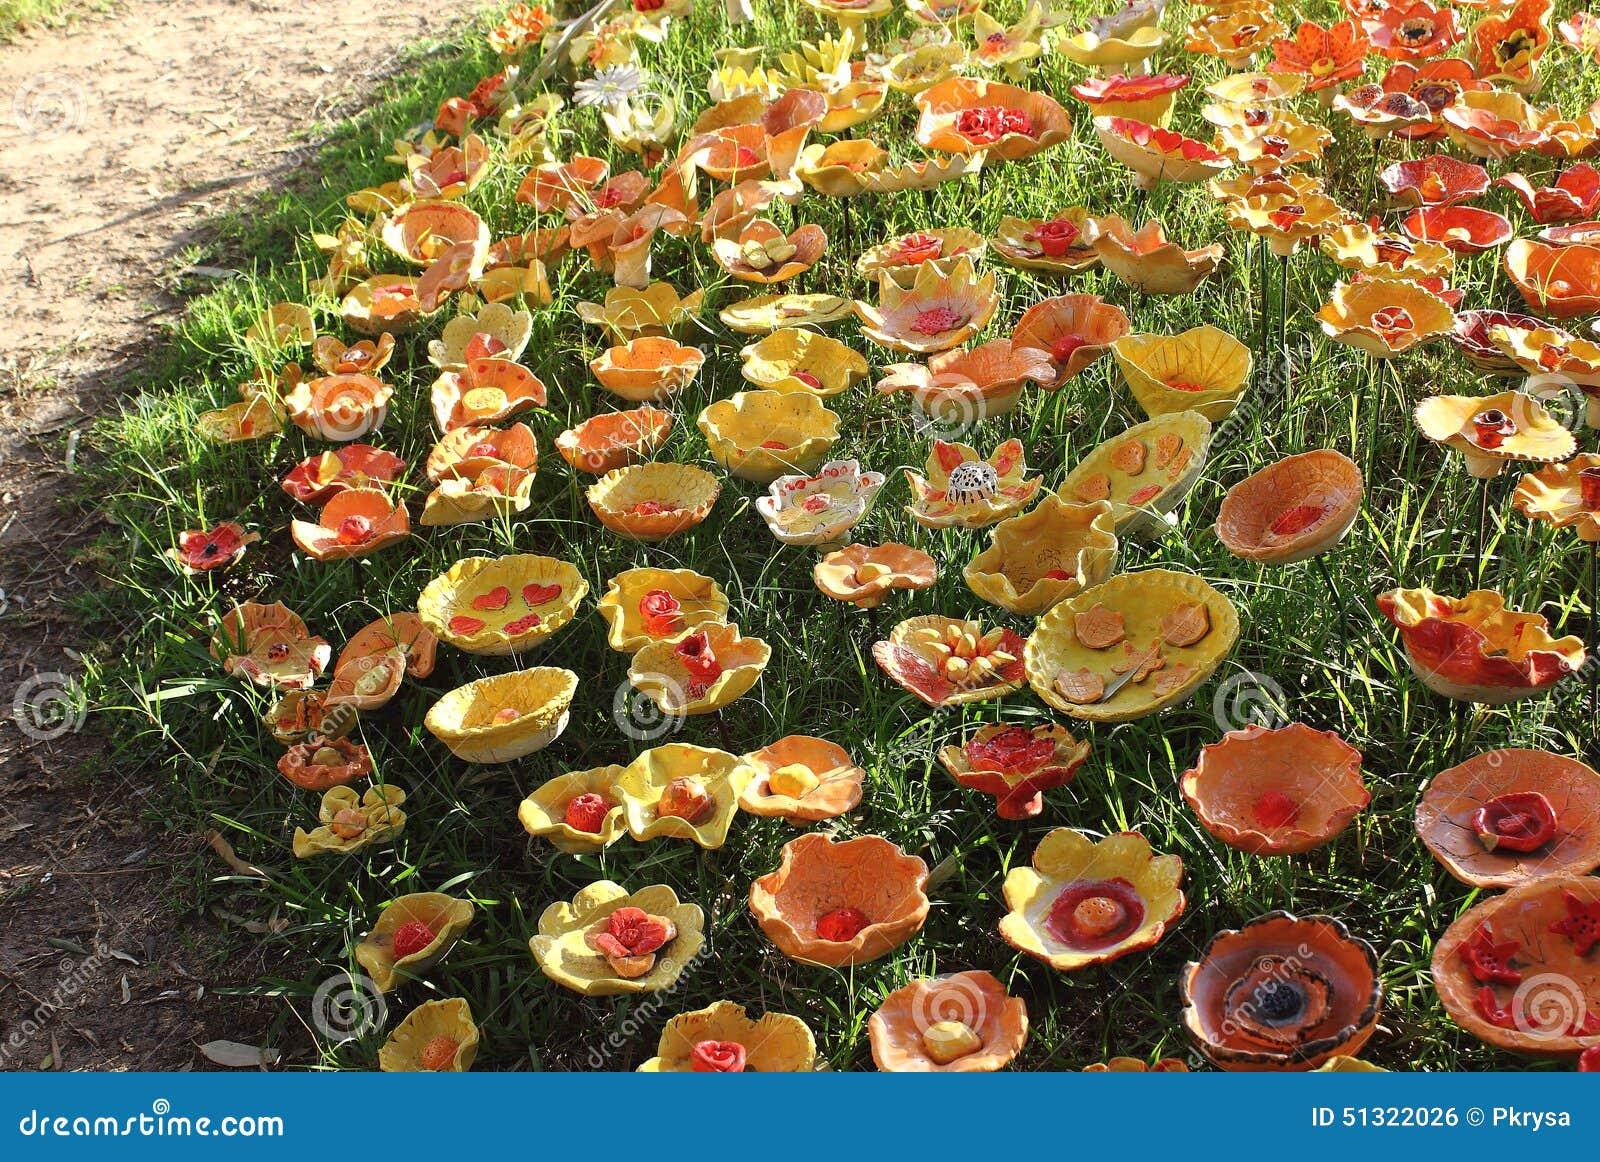 Fiori Di Ceramica.Fiori Di Ceramica Fotografia Stock Immagine Di Yellow